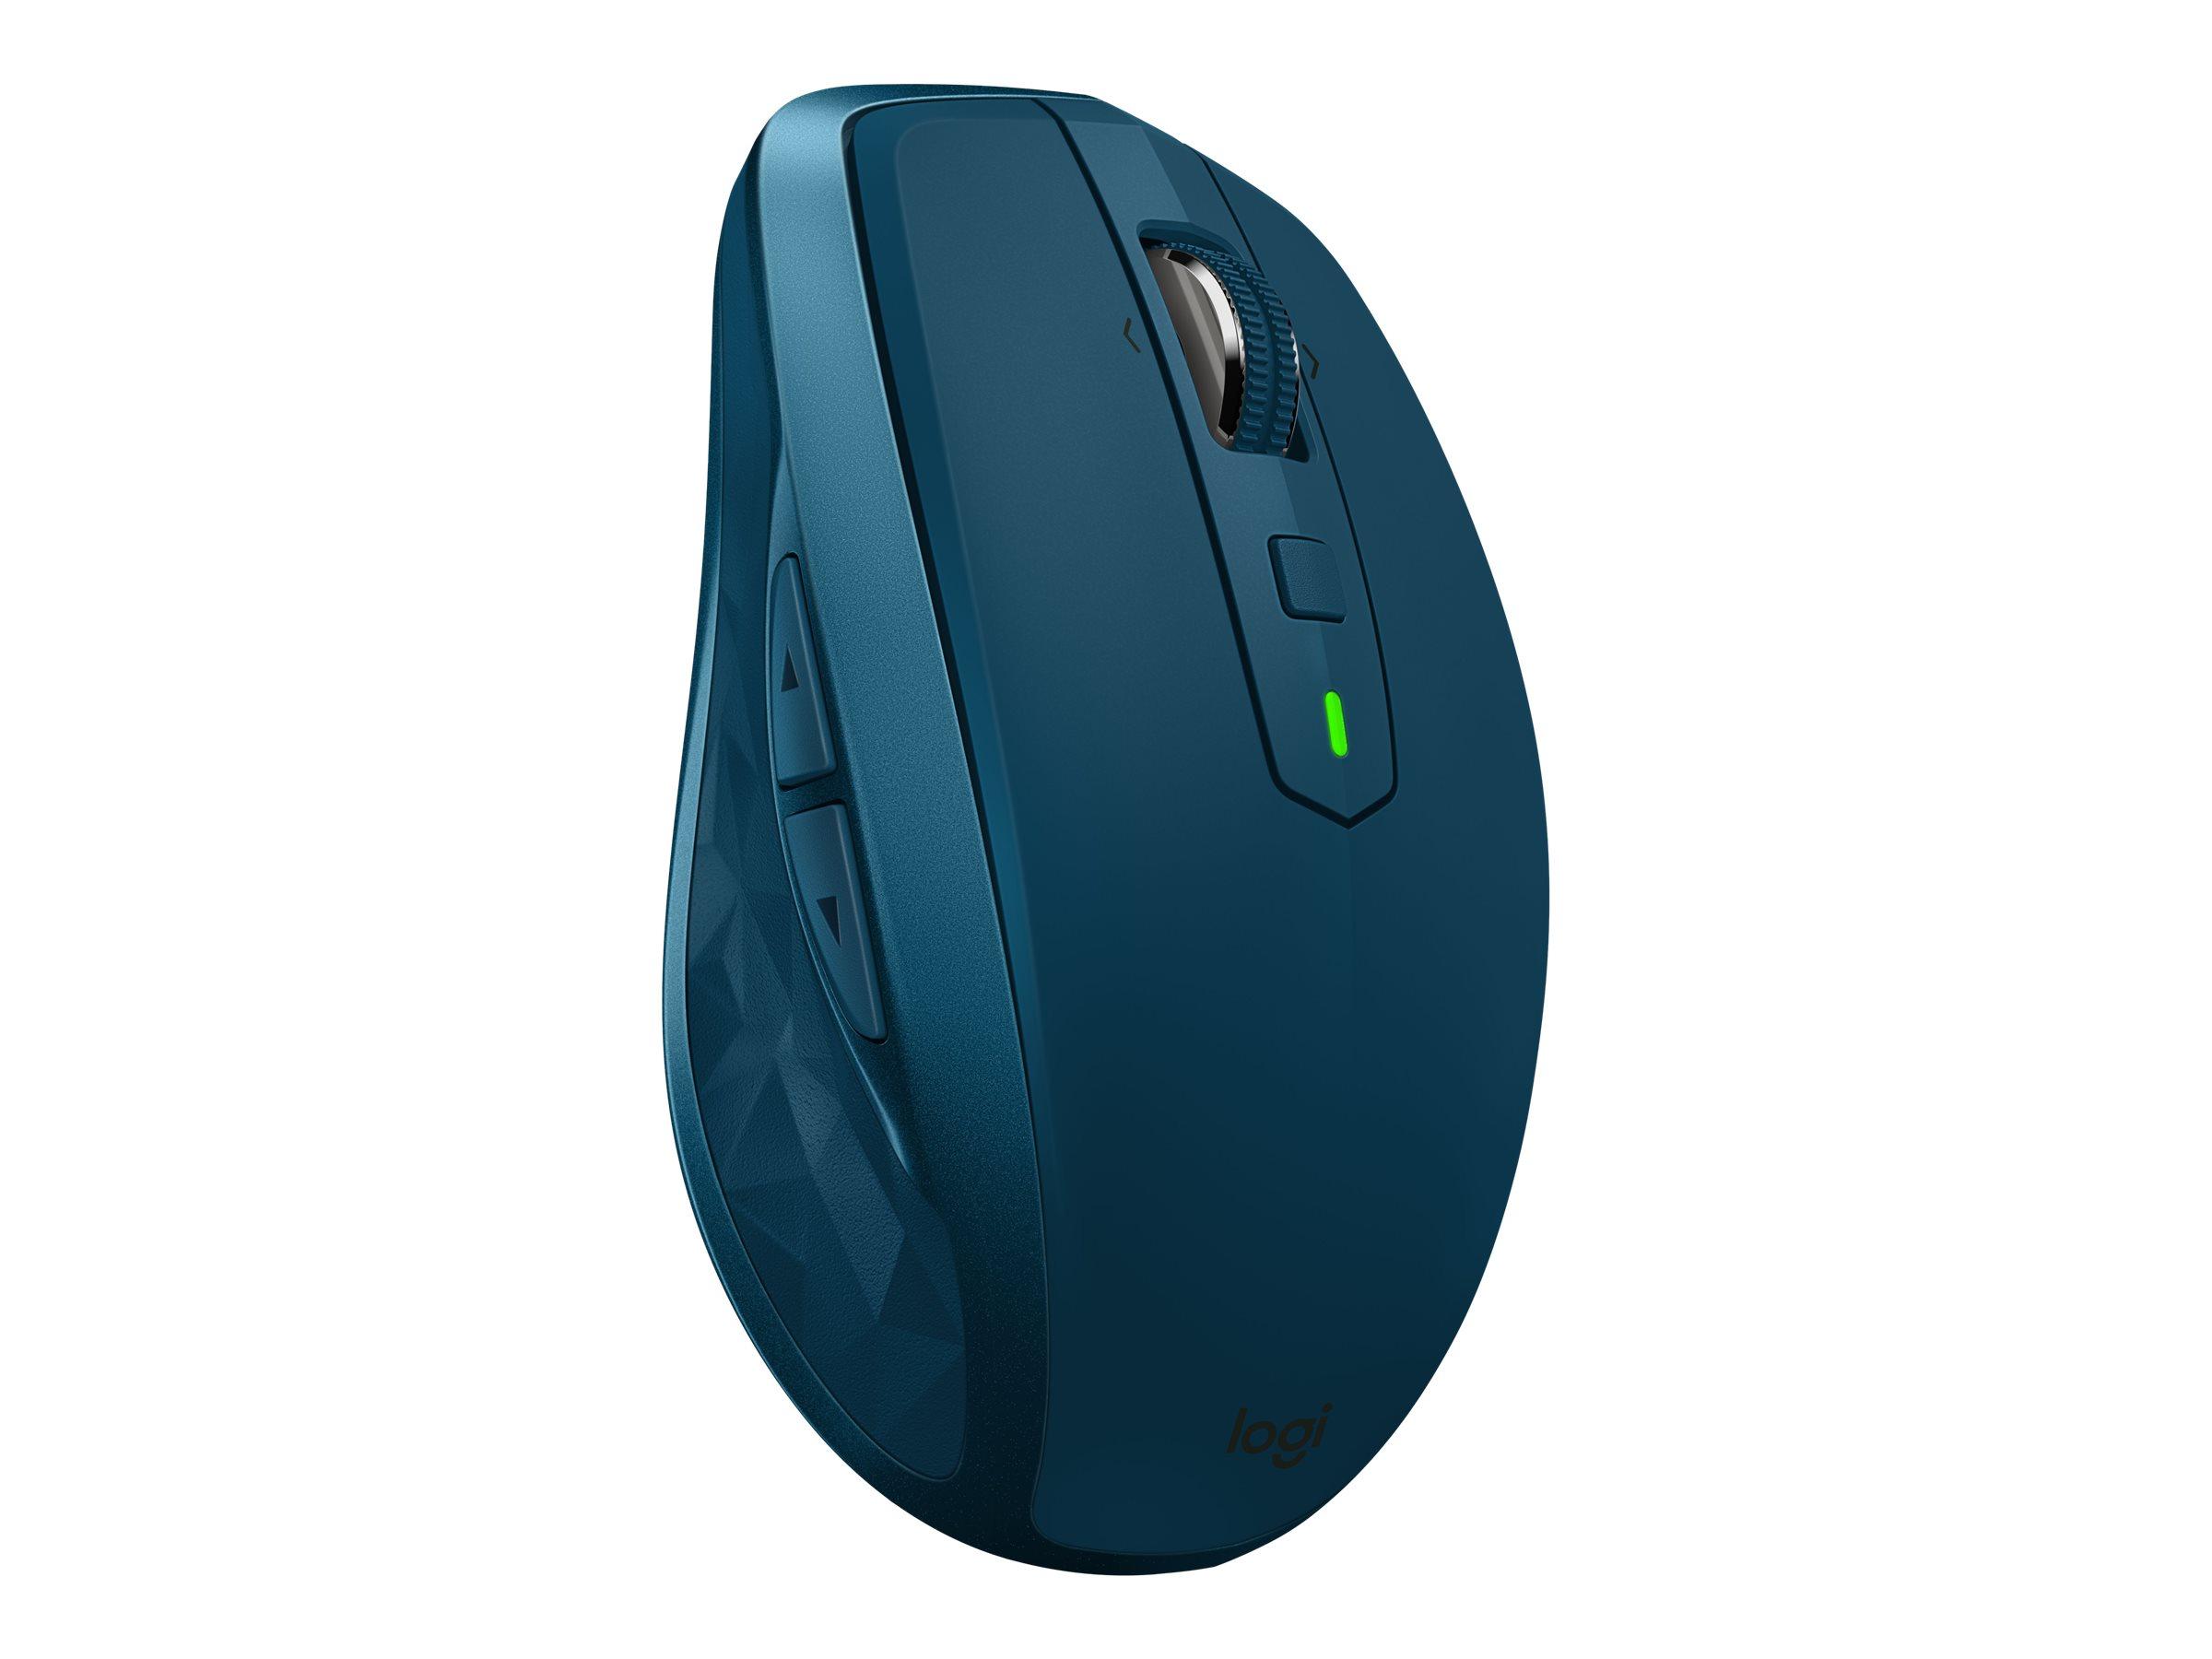 Logitech MX Anywhere 2S - Maus - Laser - 7 Tasten - kabellos - Bluetooth, 2.4 GHz